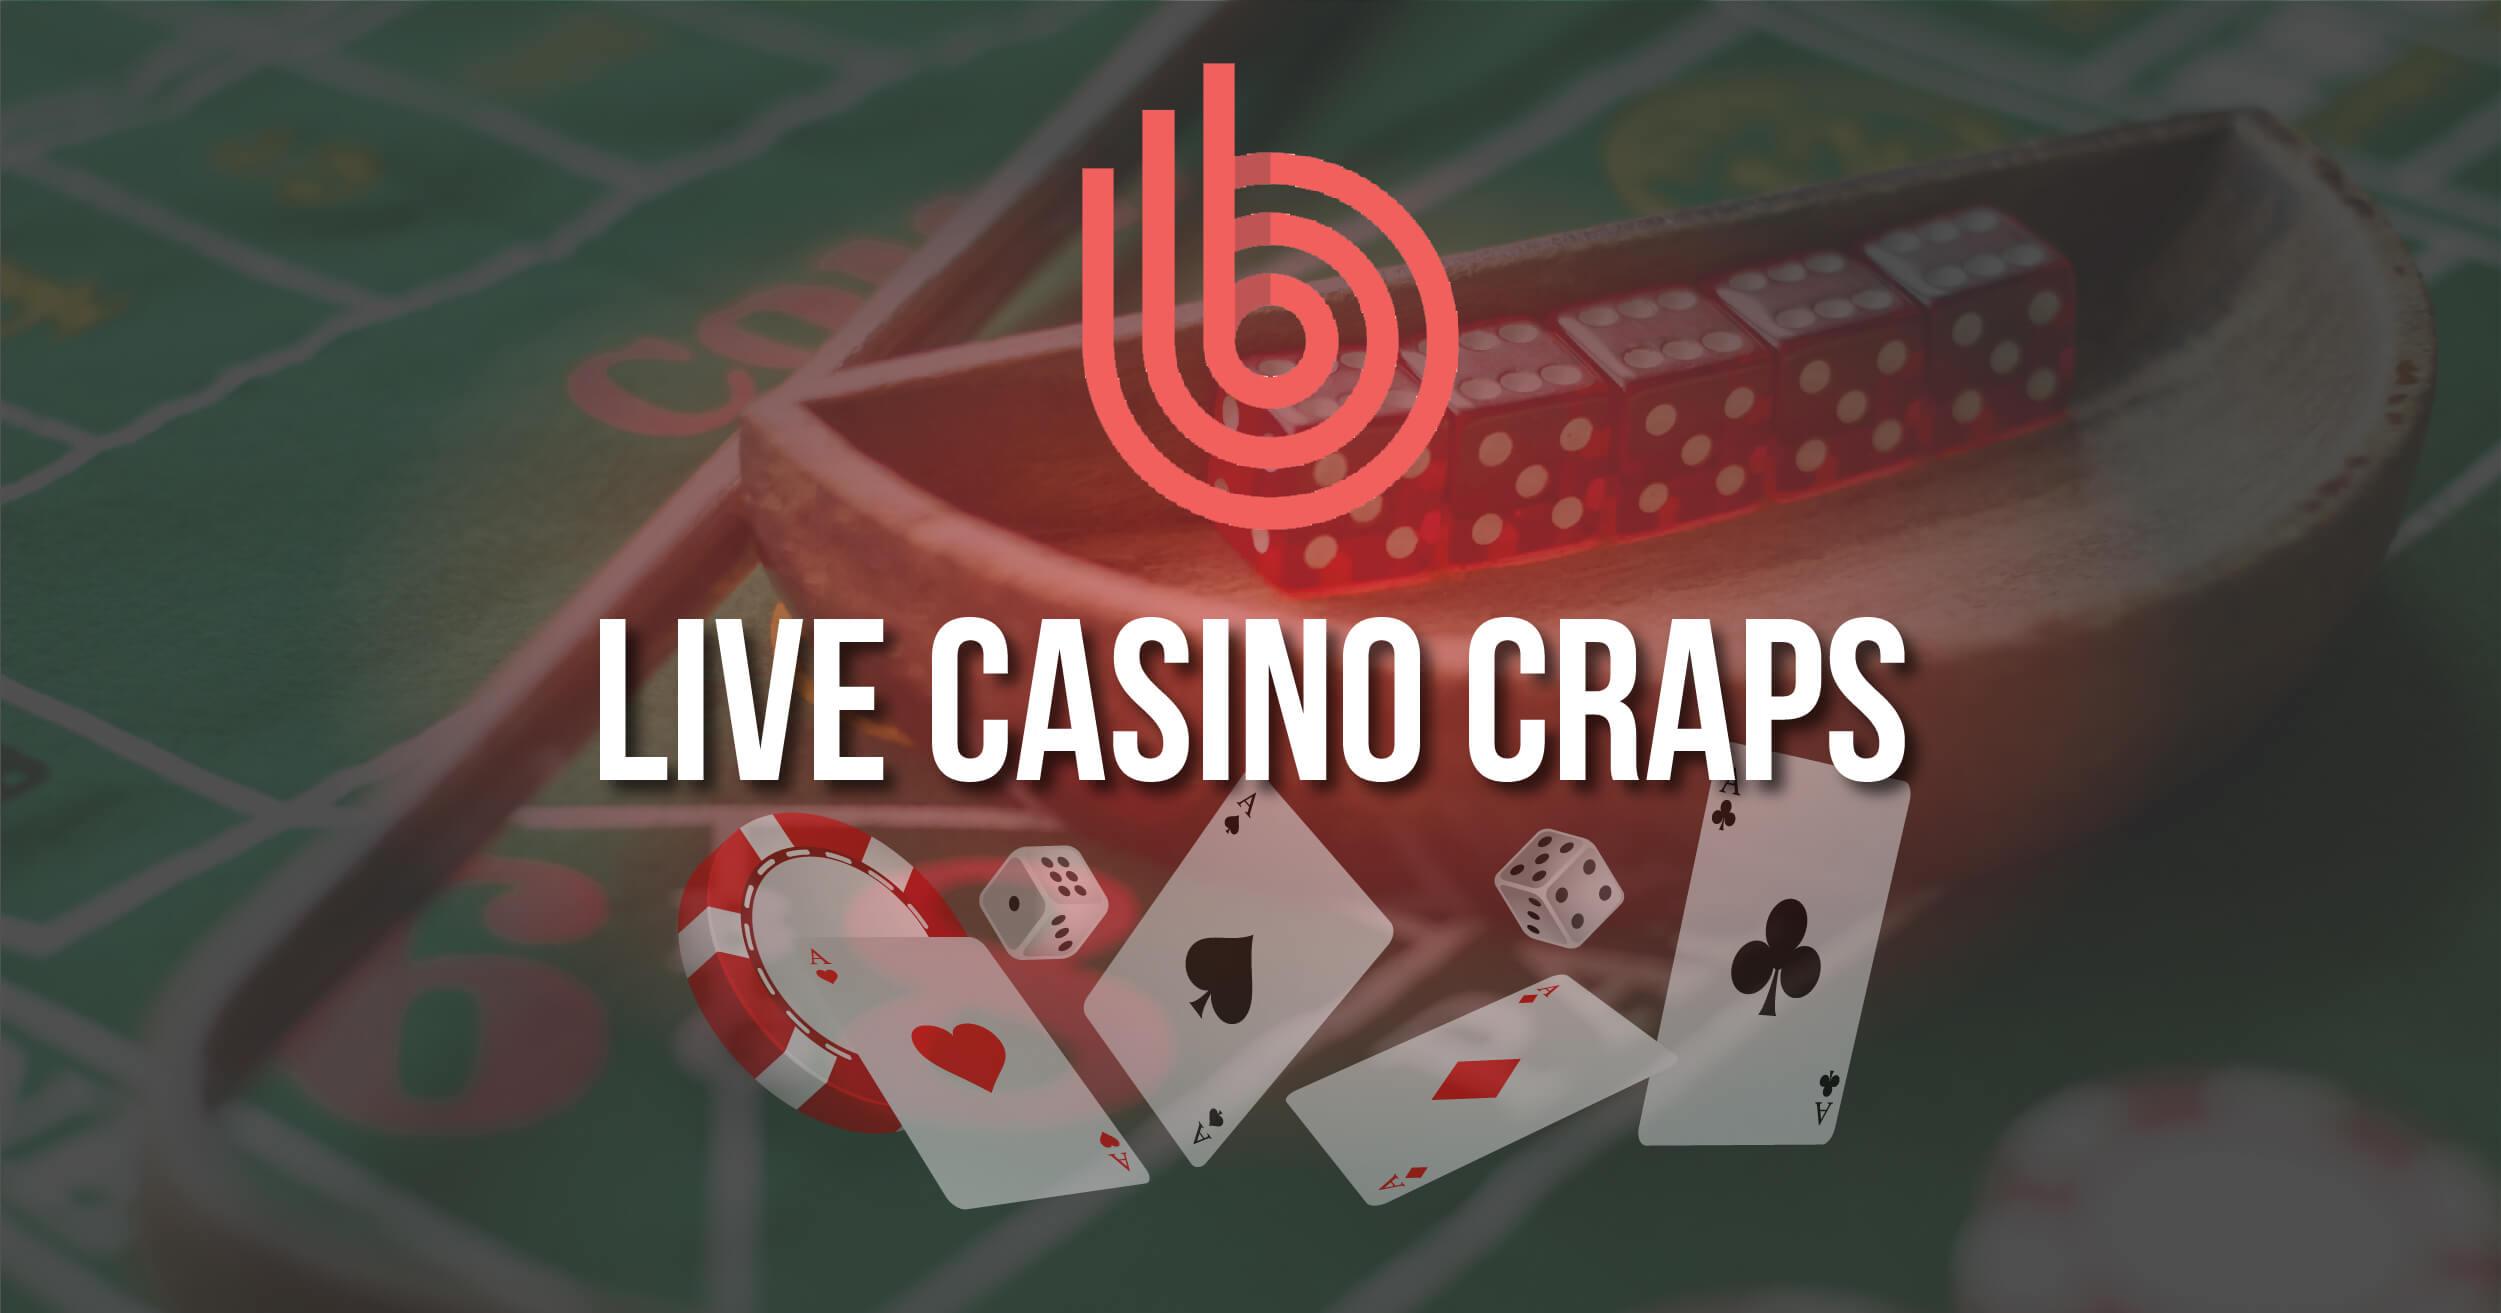 Live Casino Craps Review